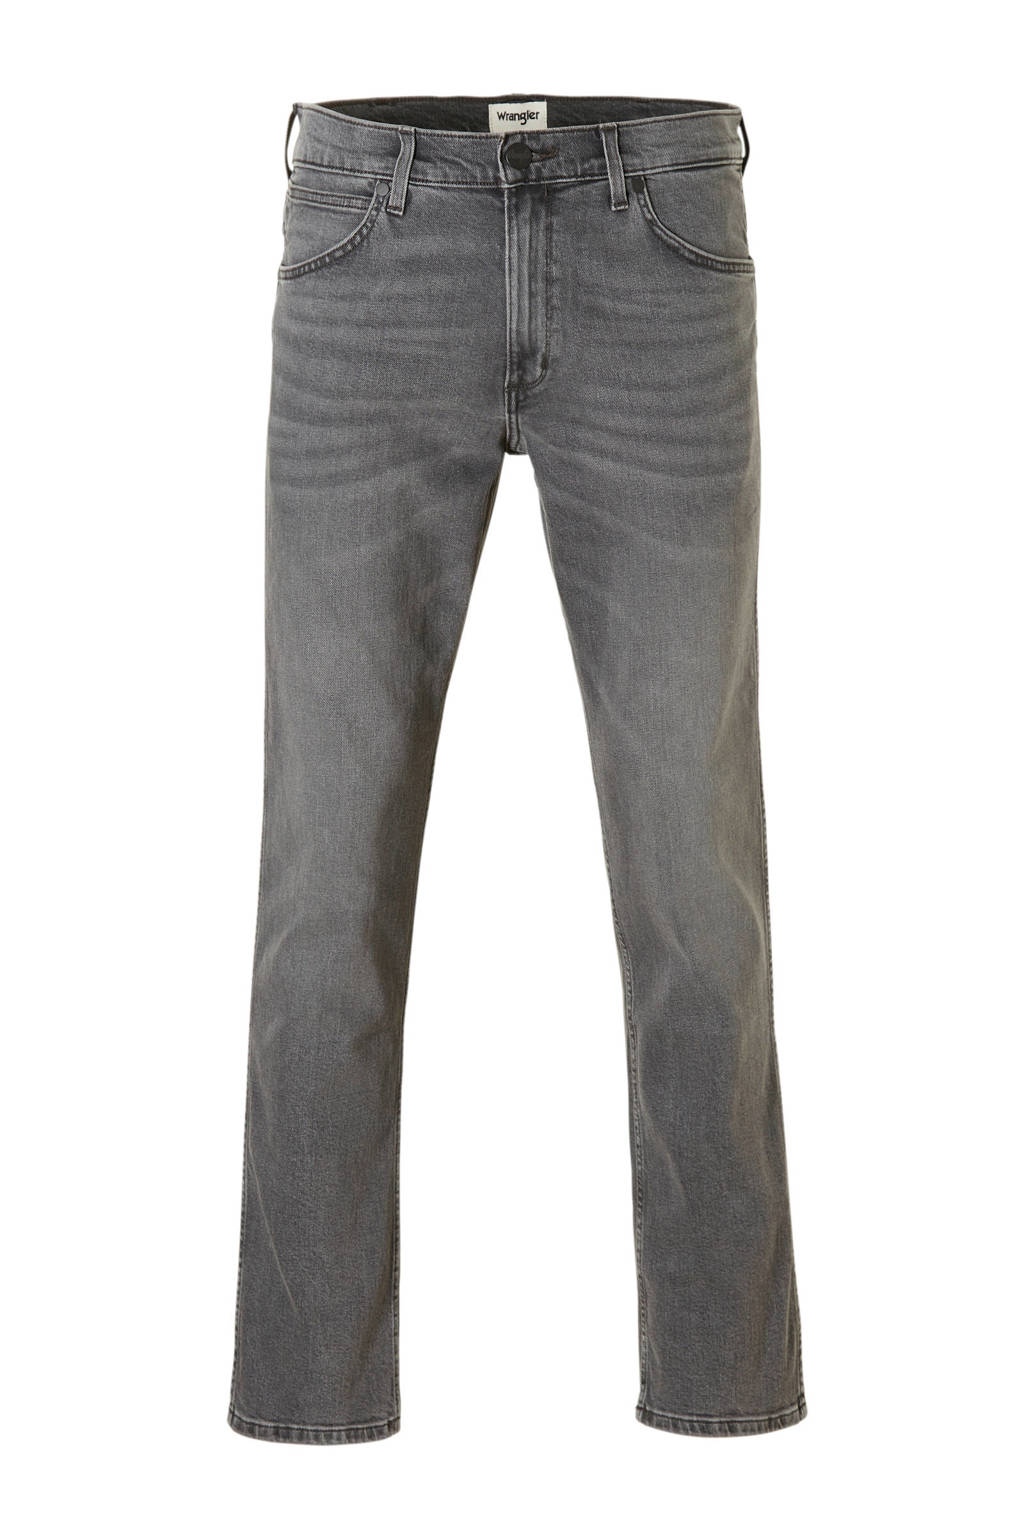 Wrangler straight fit jeans Greensboro gun smoke, Gun Smoke